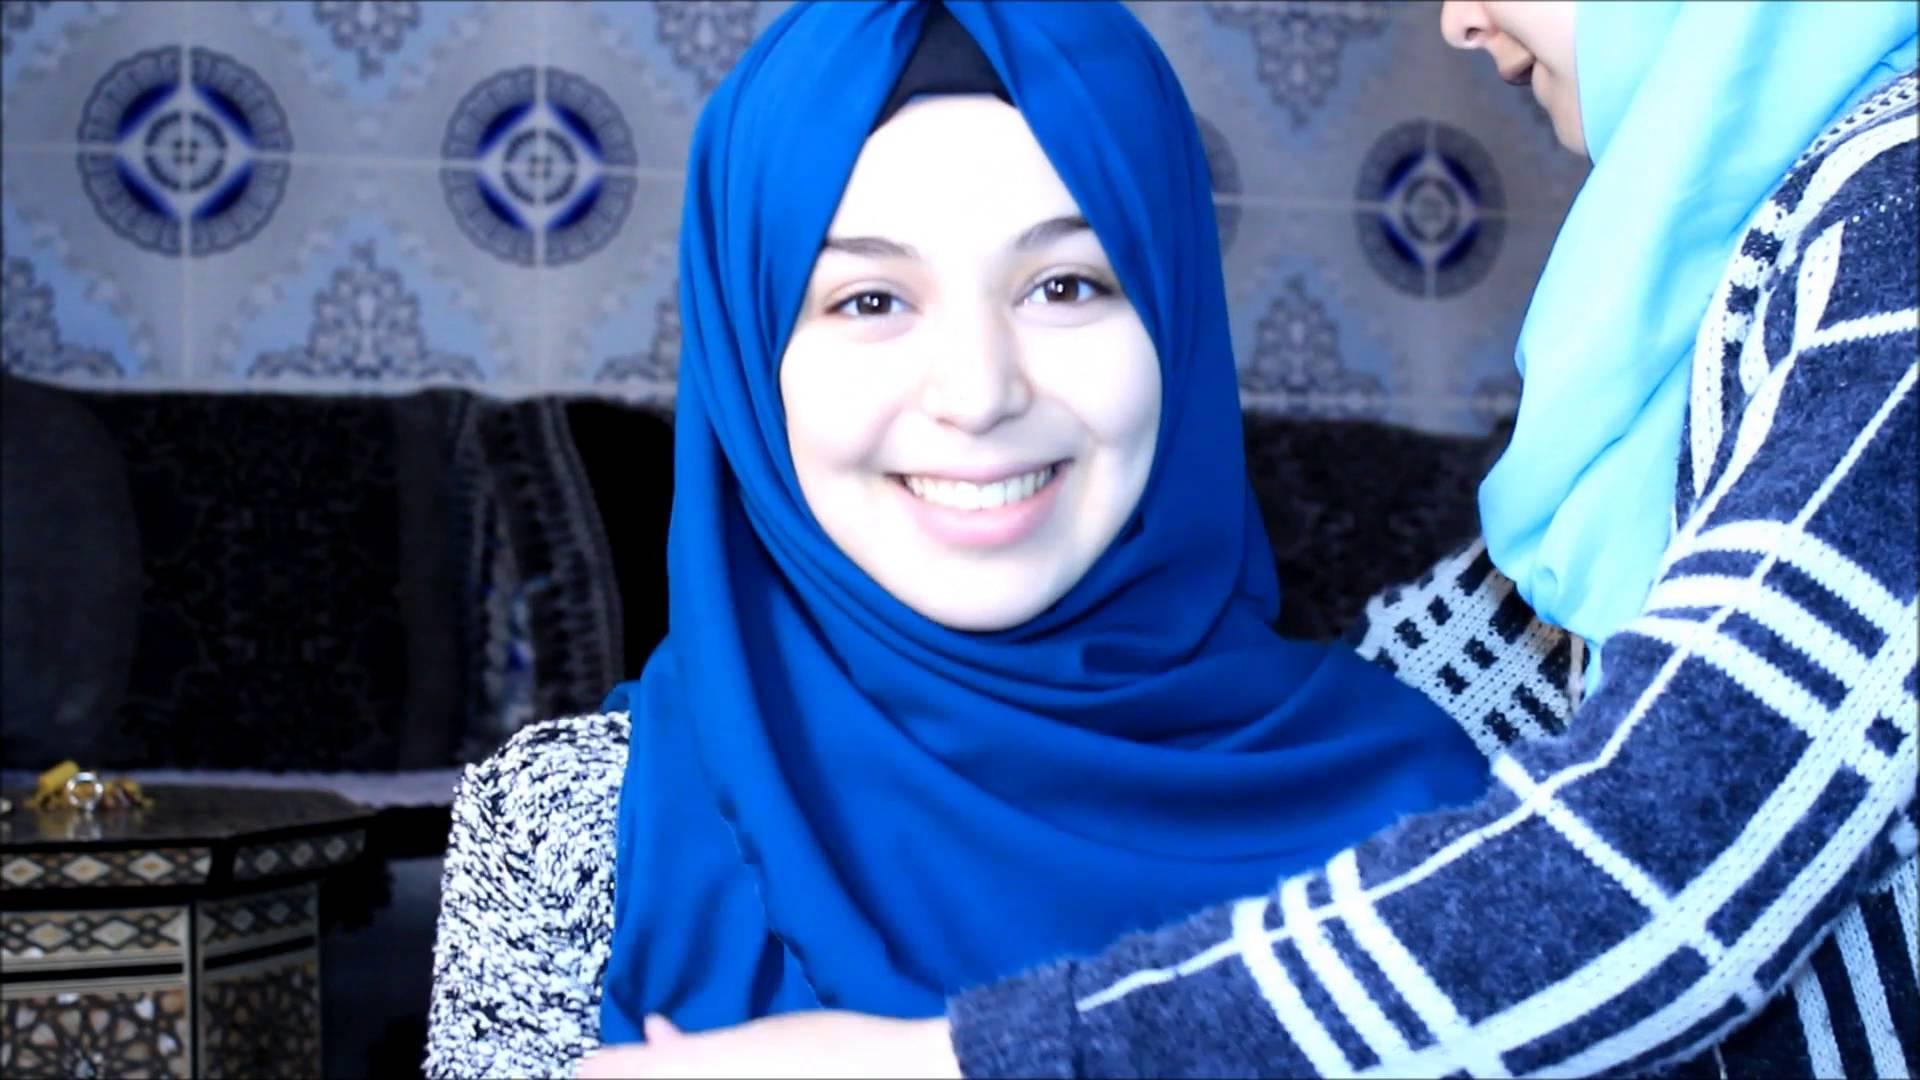 بالصور حجابات بنات , موديلات للفة حجاب بنات 906 4